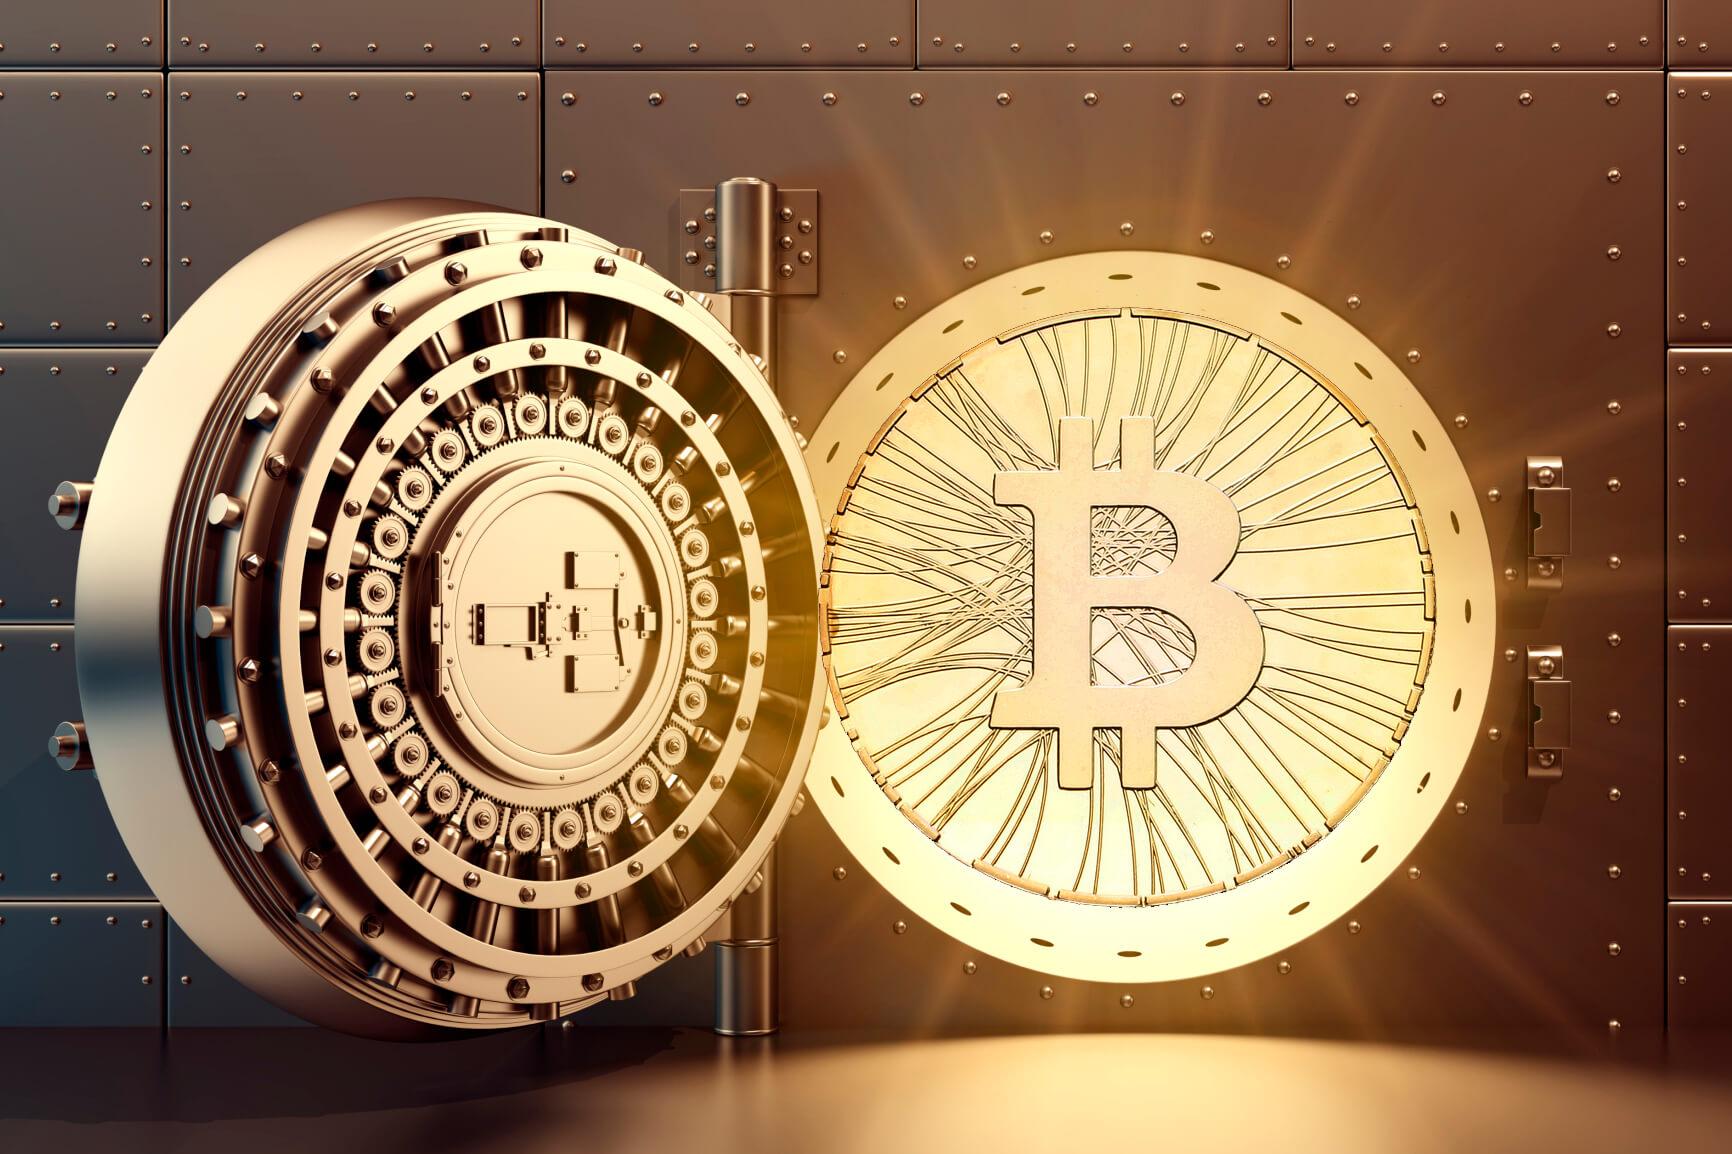 Биткоин более привлекателен, чем золото и акции, — ведущий аналитик Bloomberg